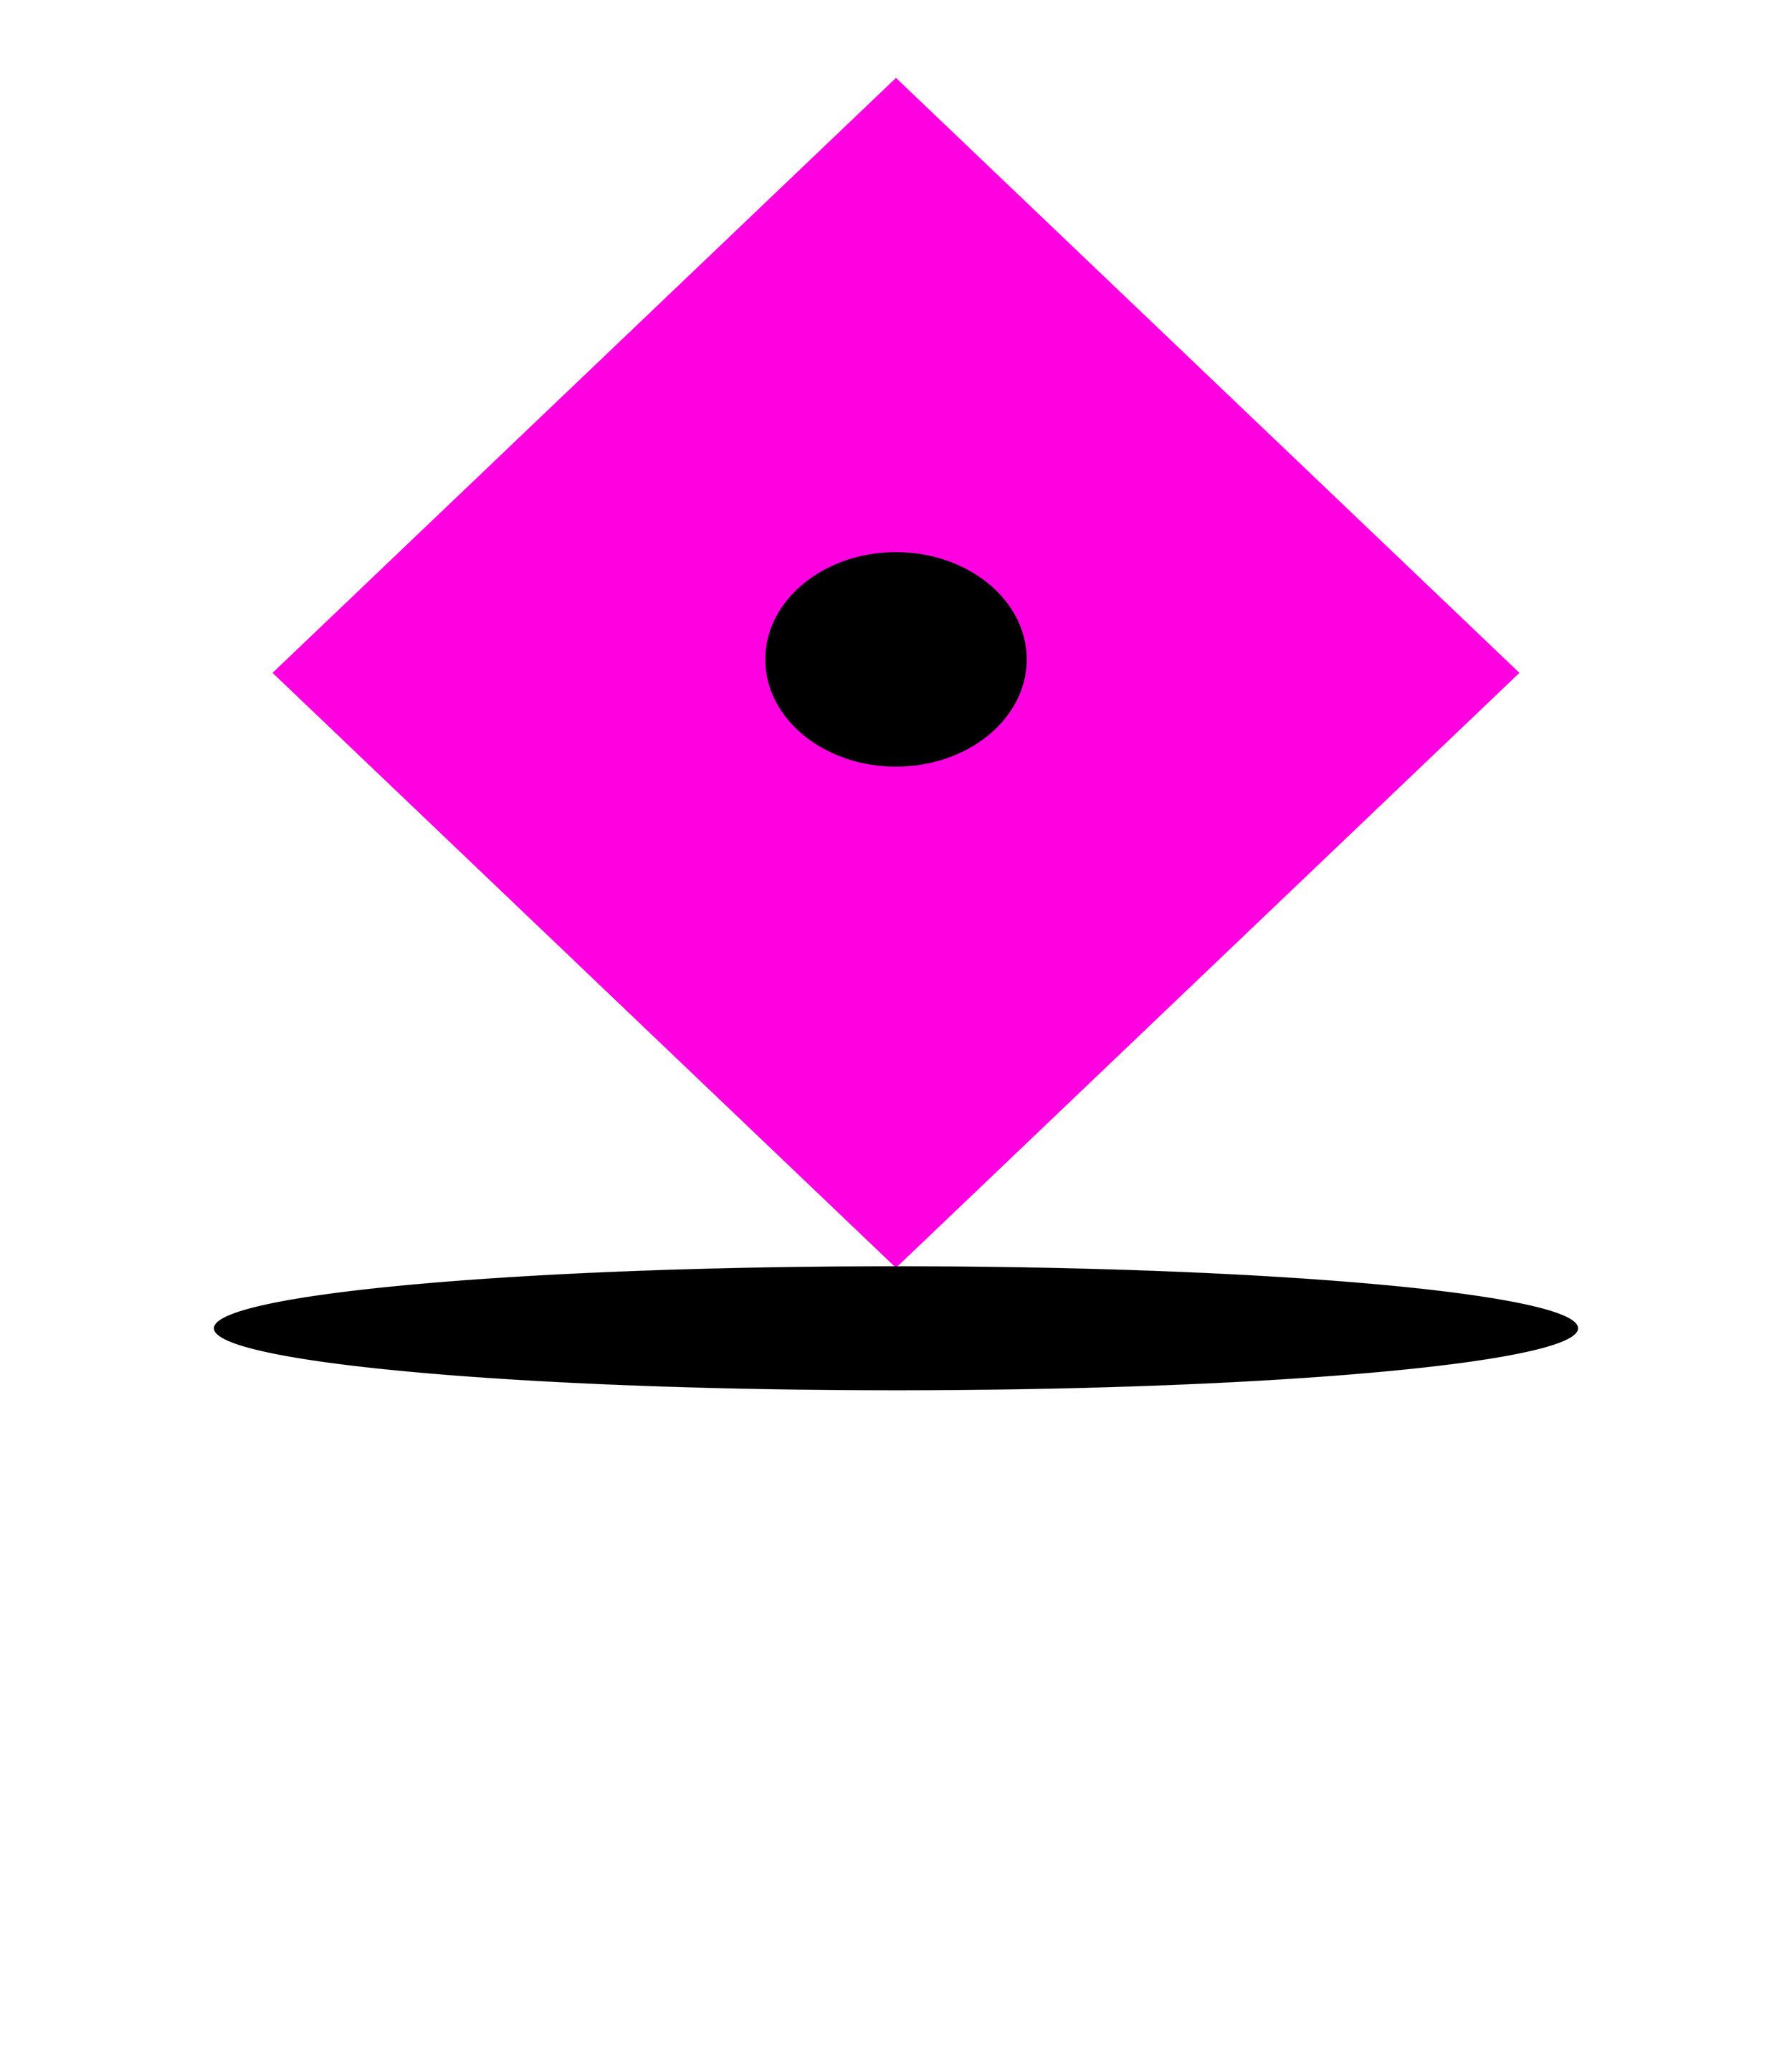 illuminati copy.jpg